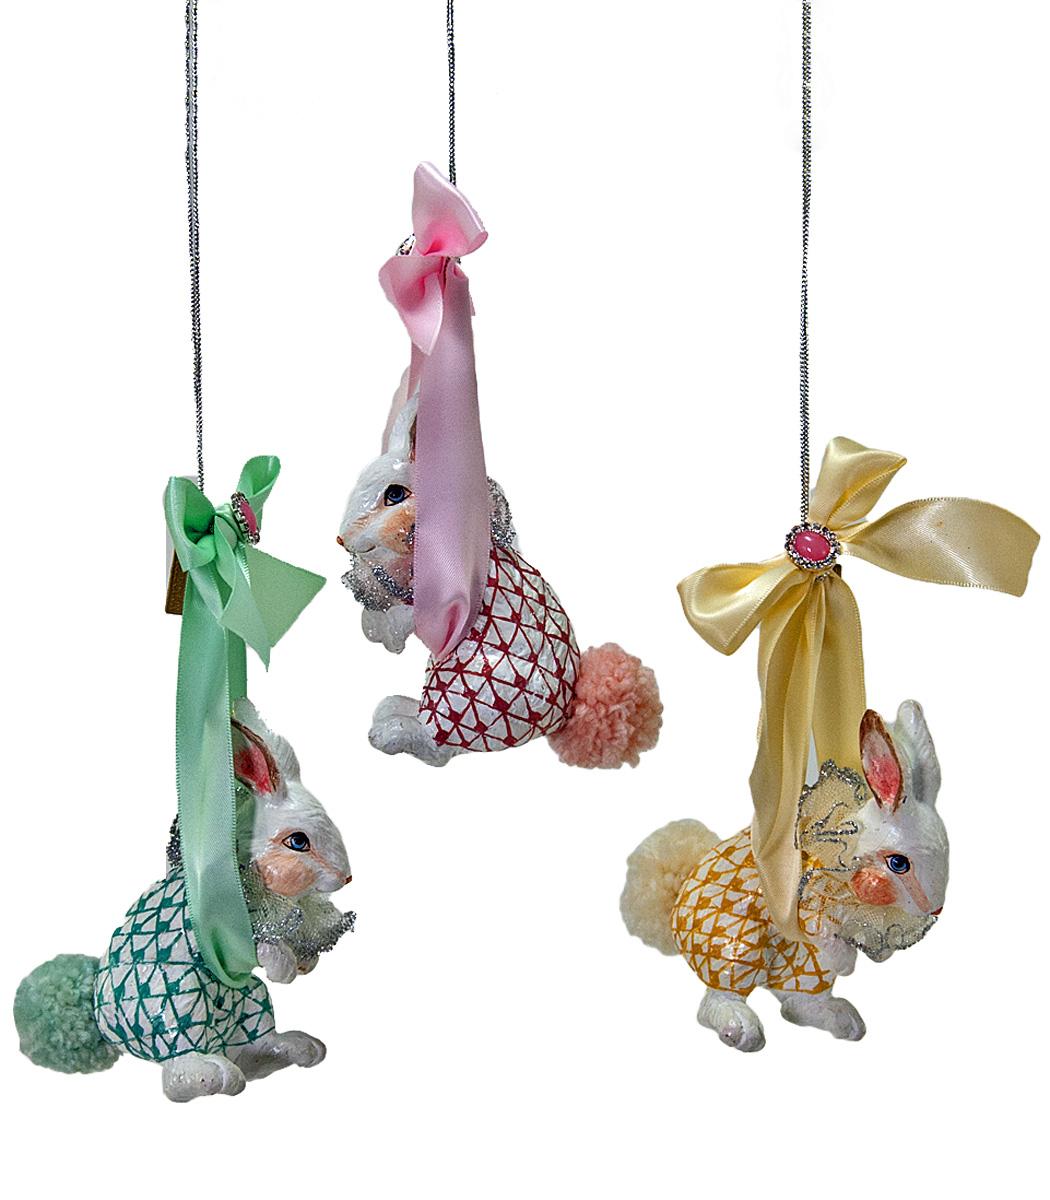 Bundle Of Joy Ornament - Assortment Of 3  28-530439